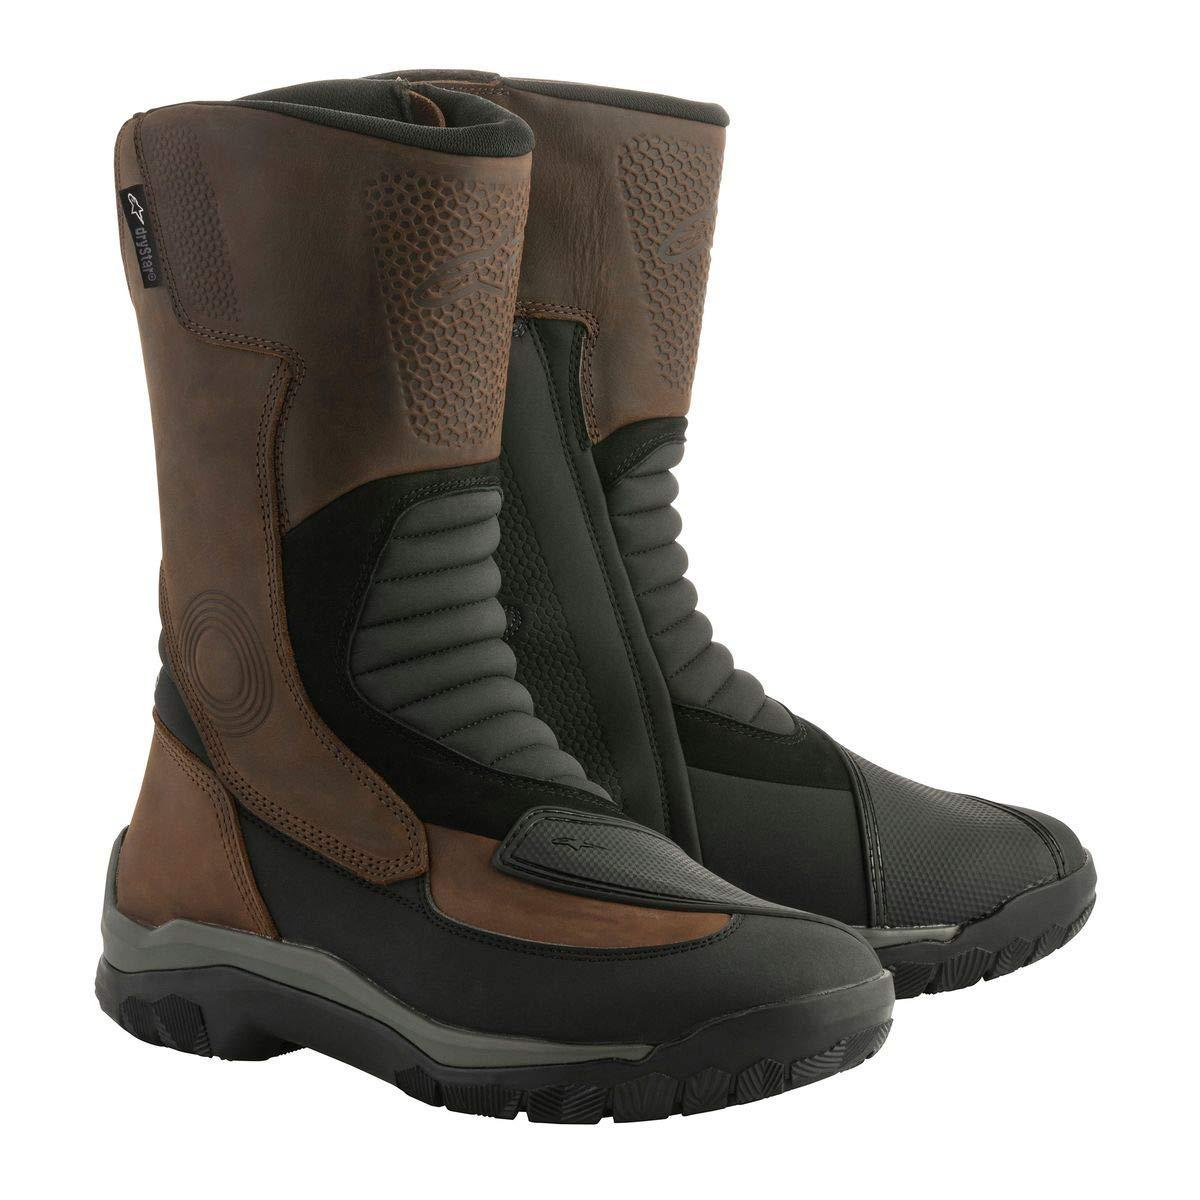 Alpinestars Mens 2443418 82 11 Boots Brown